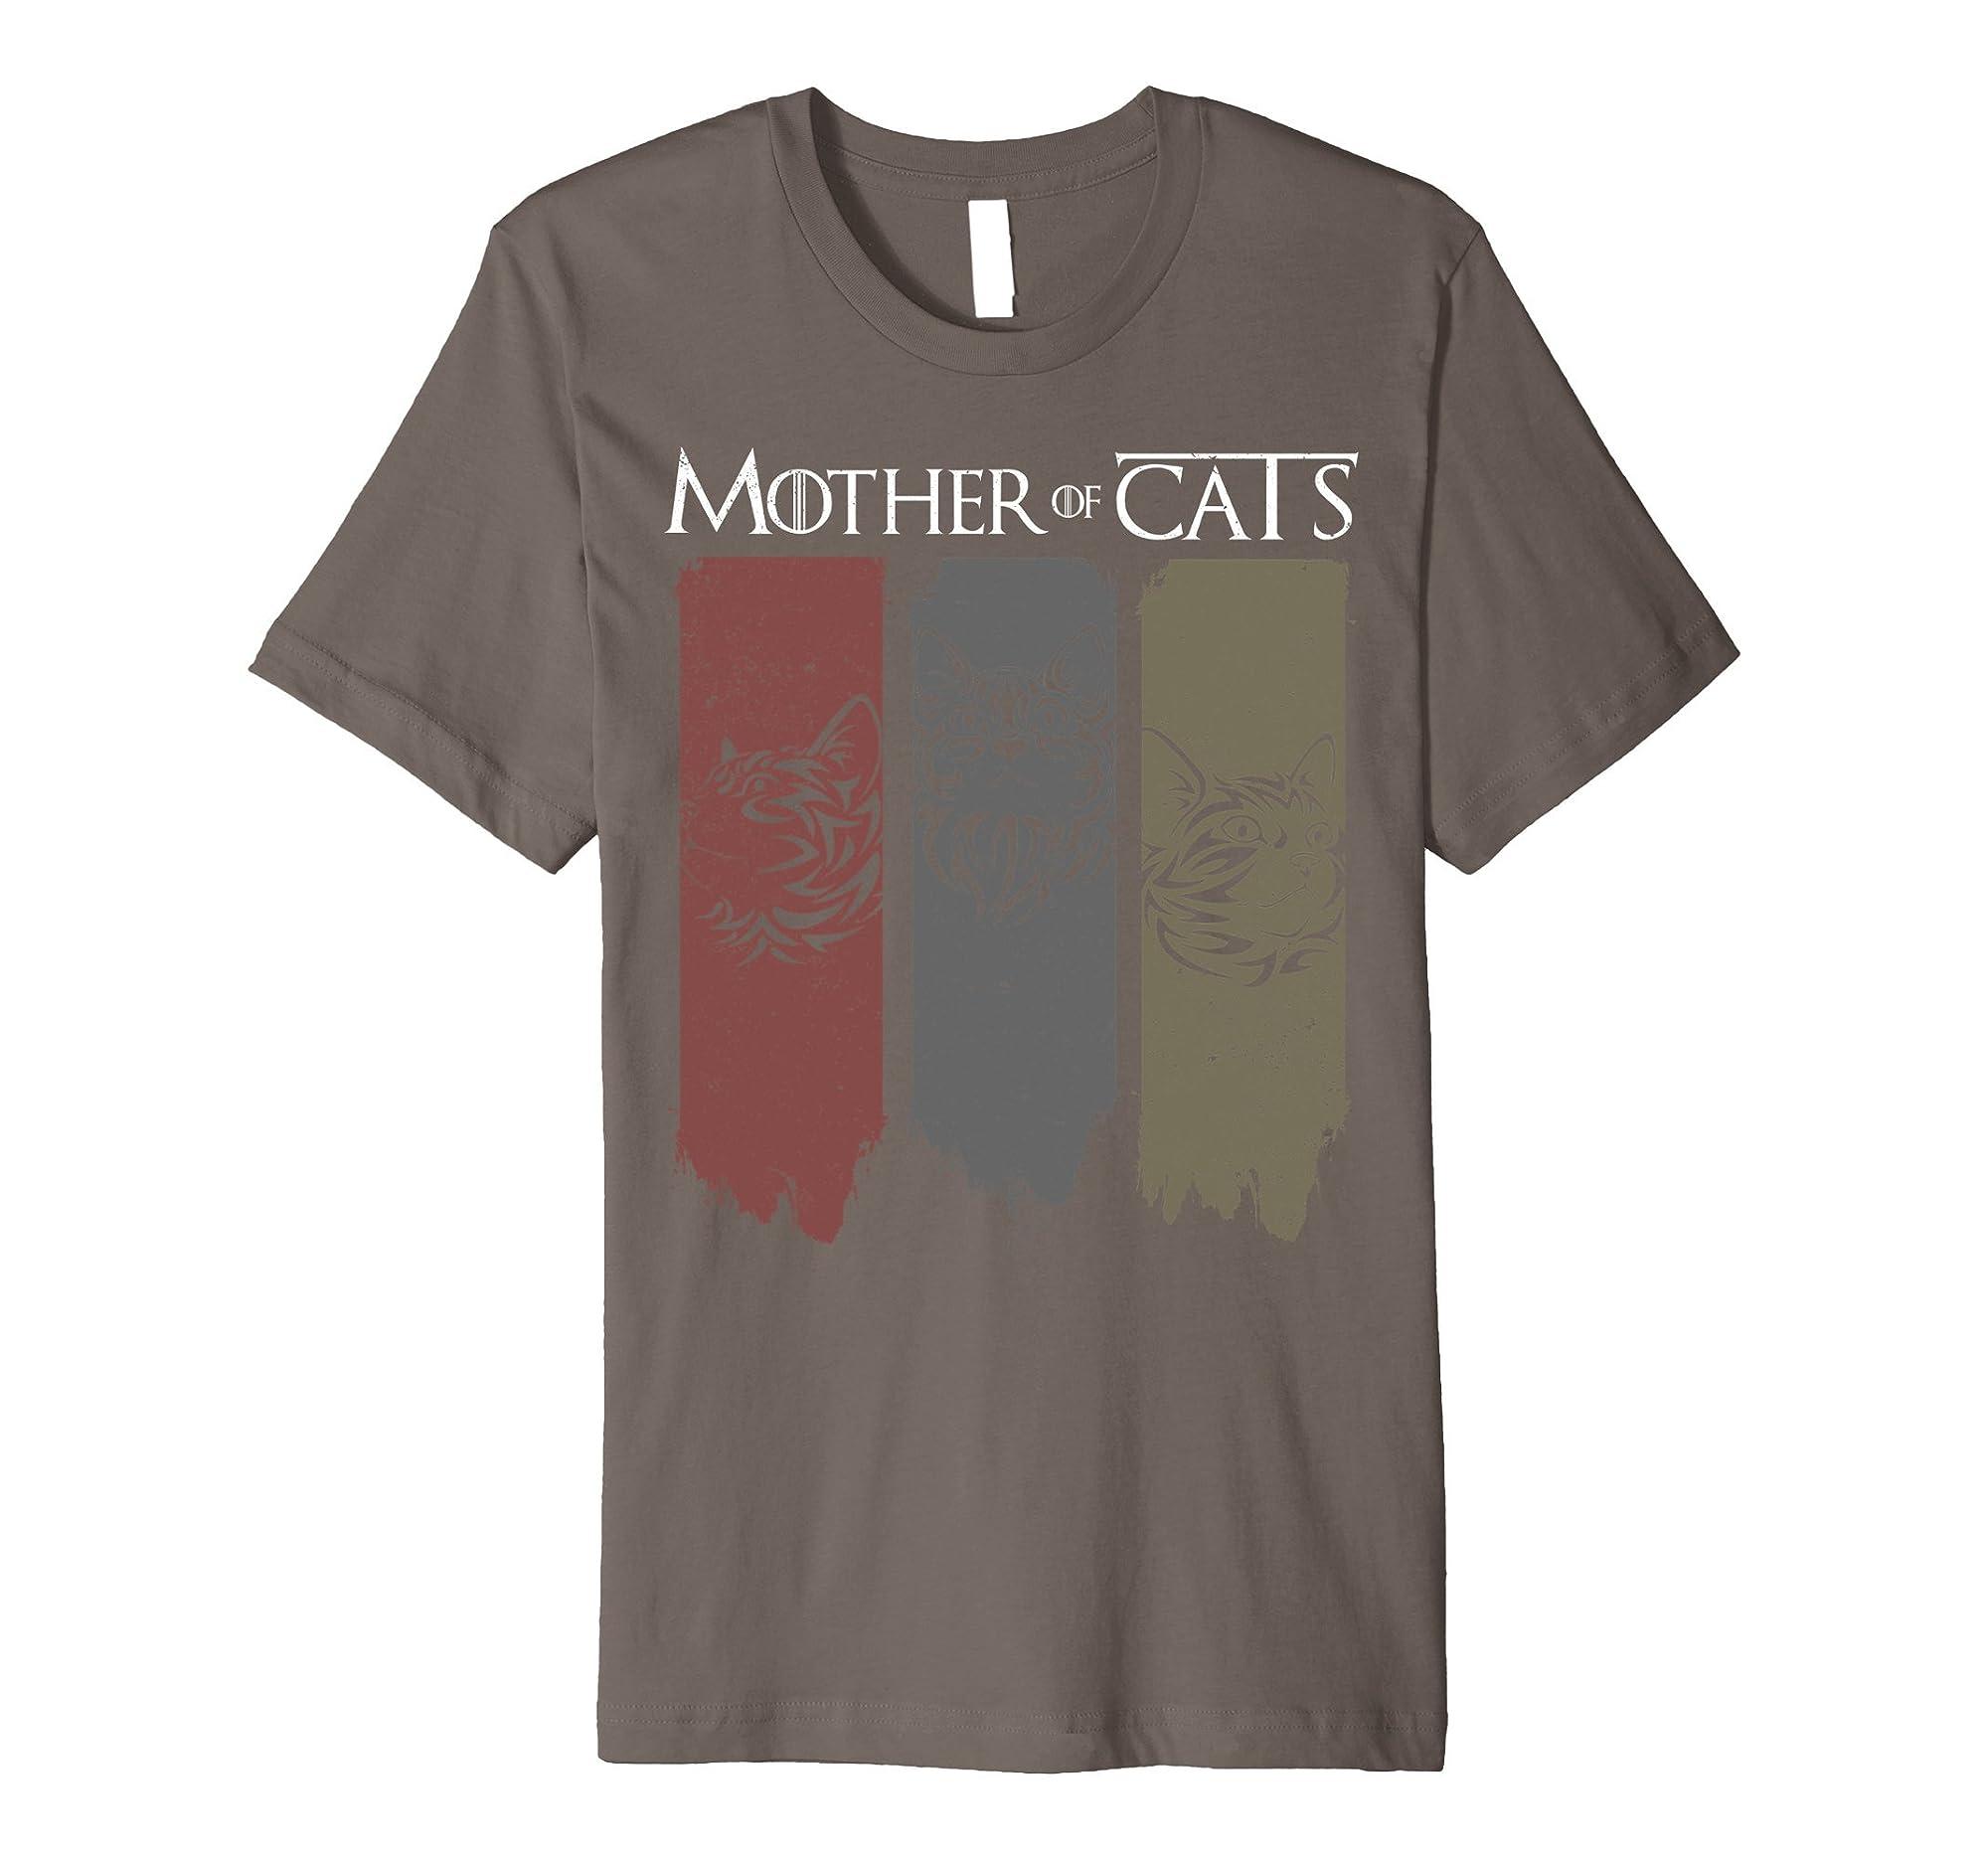 Dtanice Shirt Dta Premium Cat Lovers Shirt - Mother Of Cats Hot 2017 T-shirt